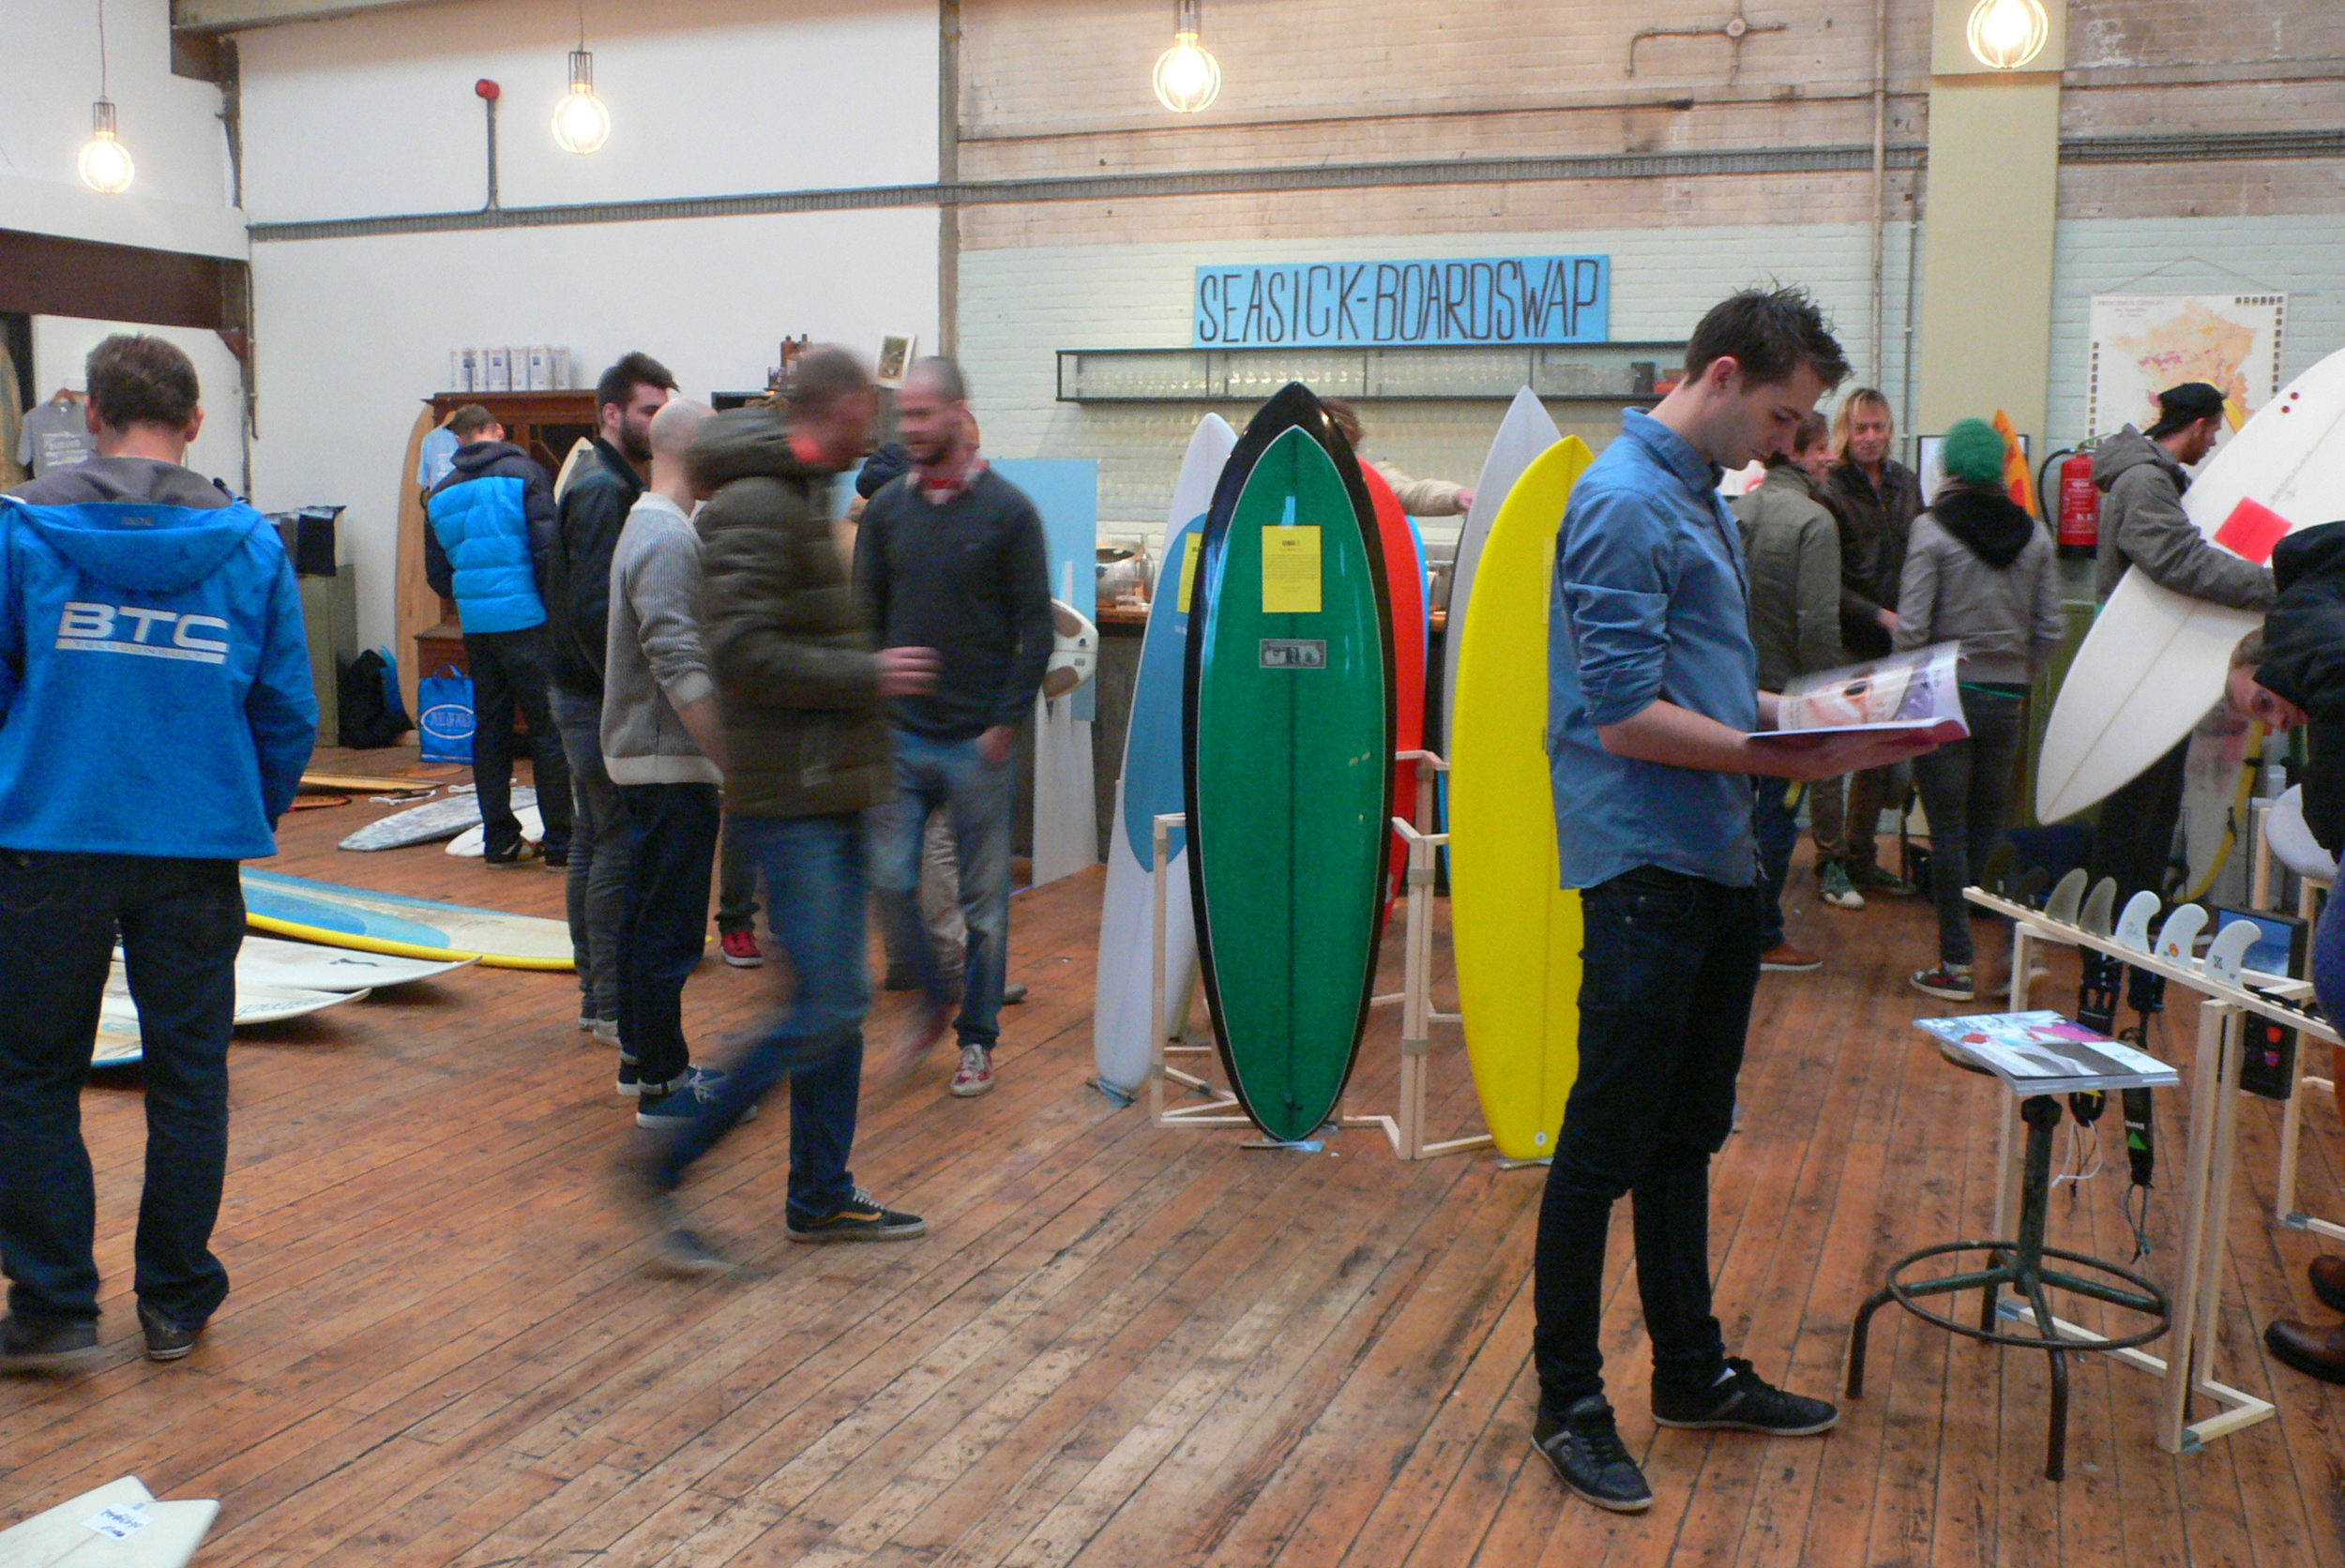 Seasicksurf_board swap_02.jpg